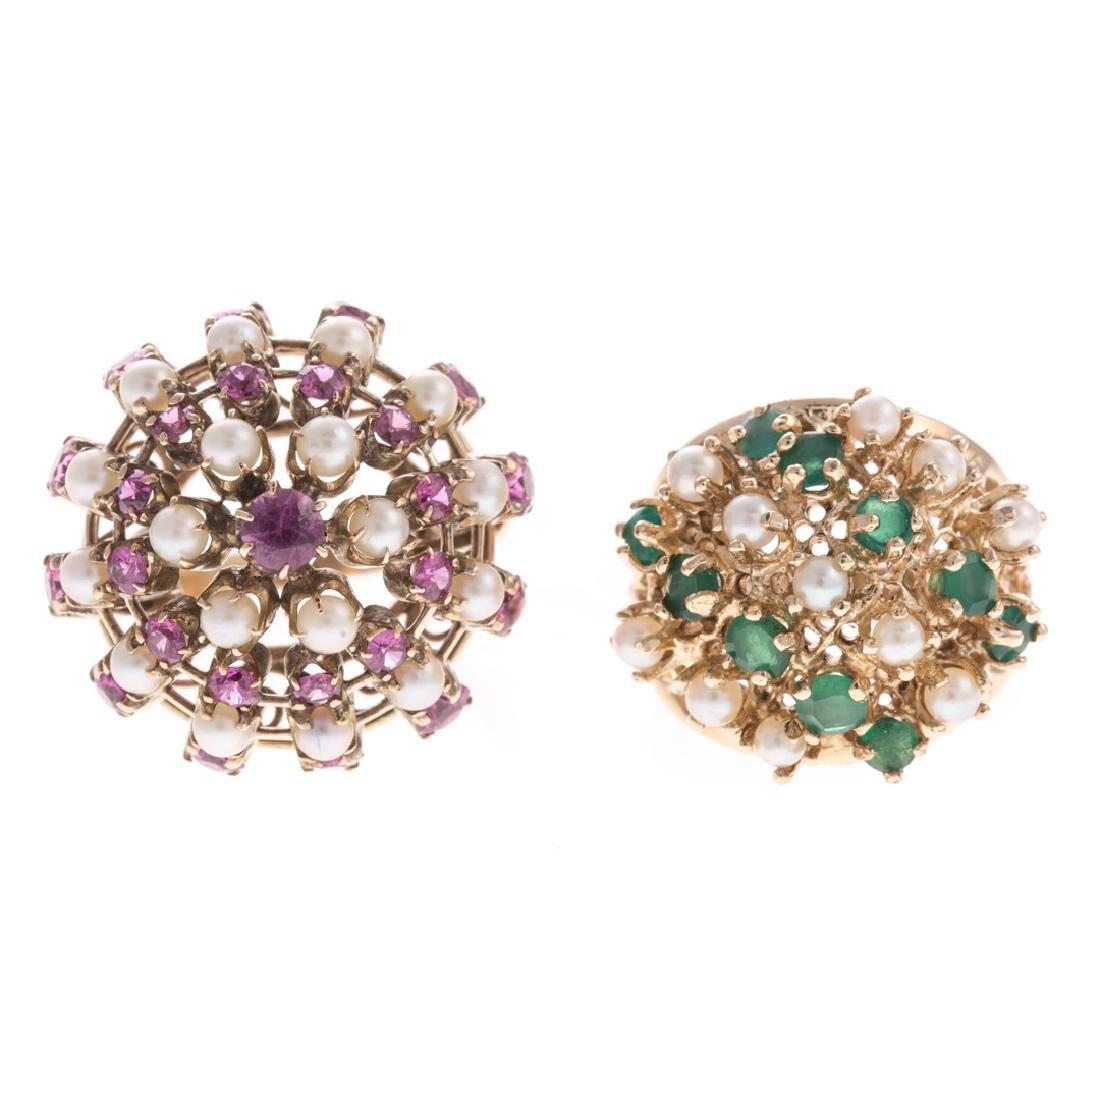 A Pair of Lady's Pearl & Gemstone Cluster Rings